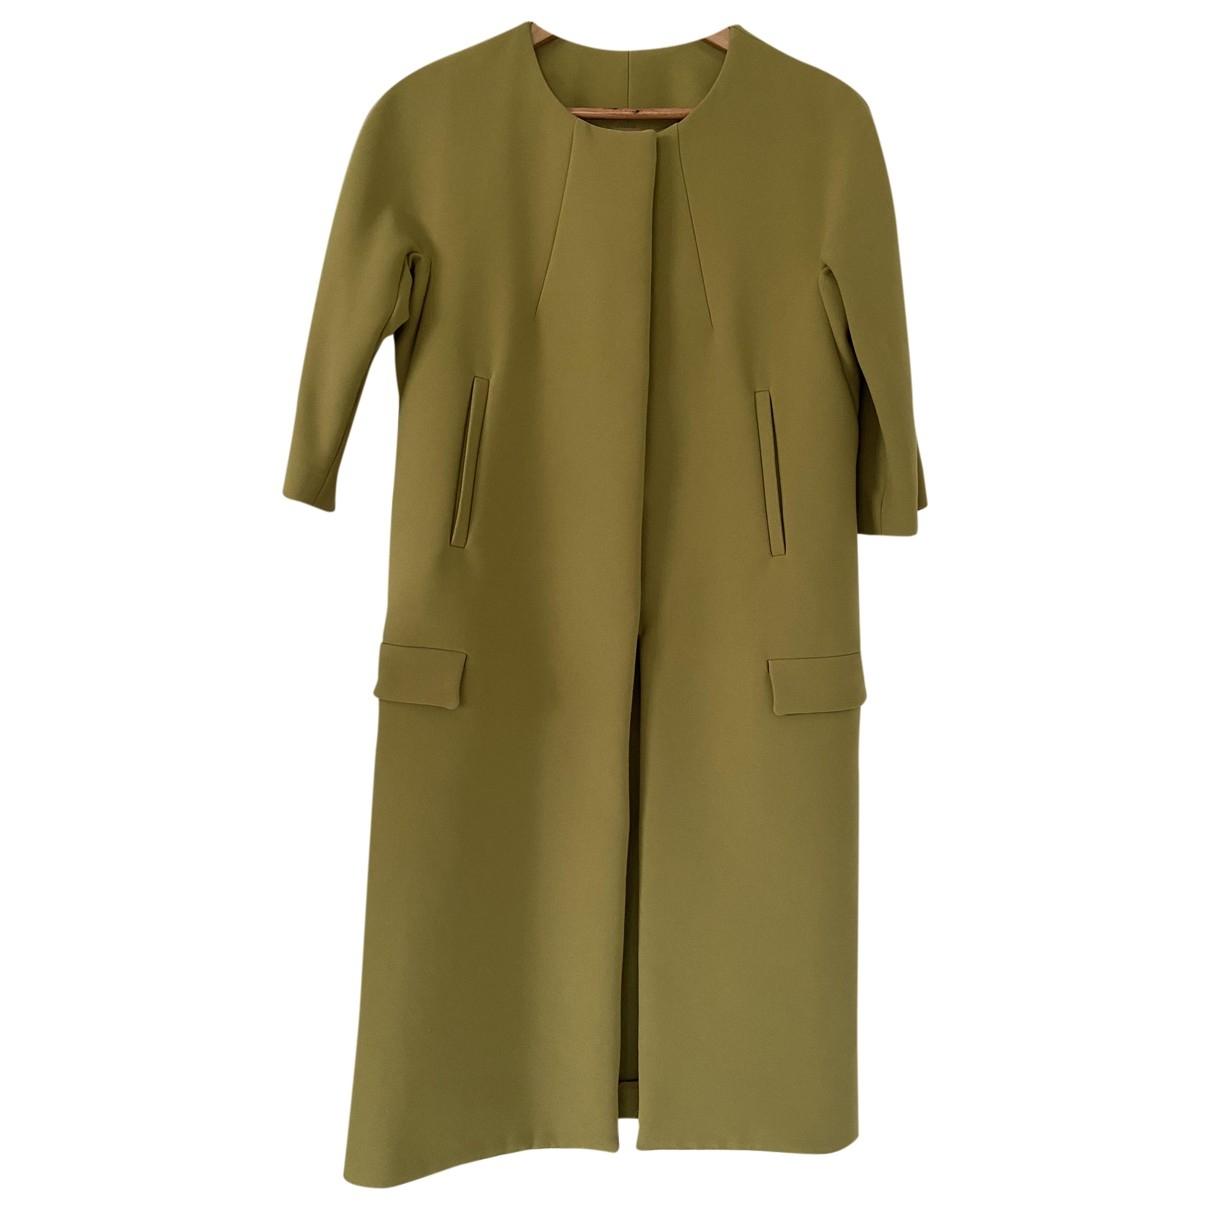 Acne Studios \N Green Cotton coat for Women 36 FR